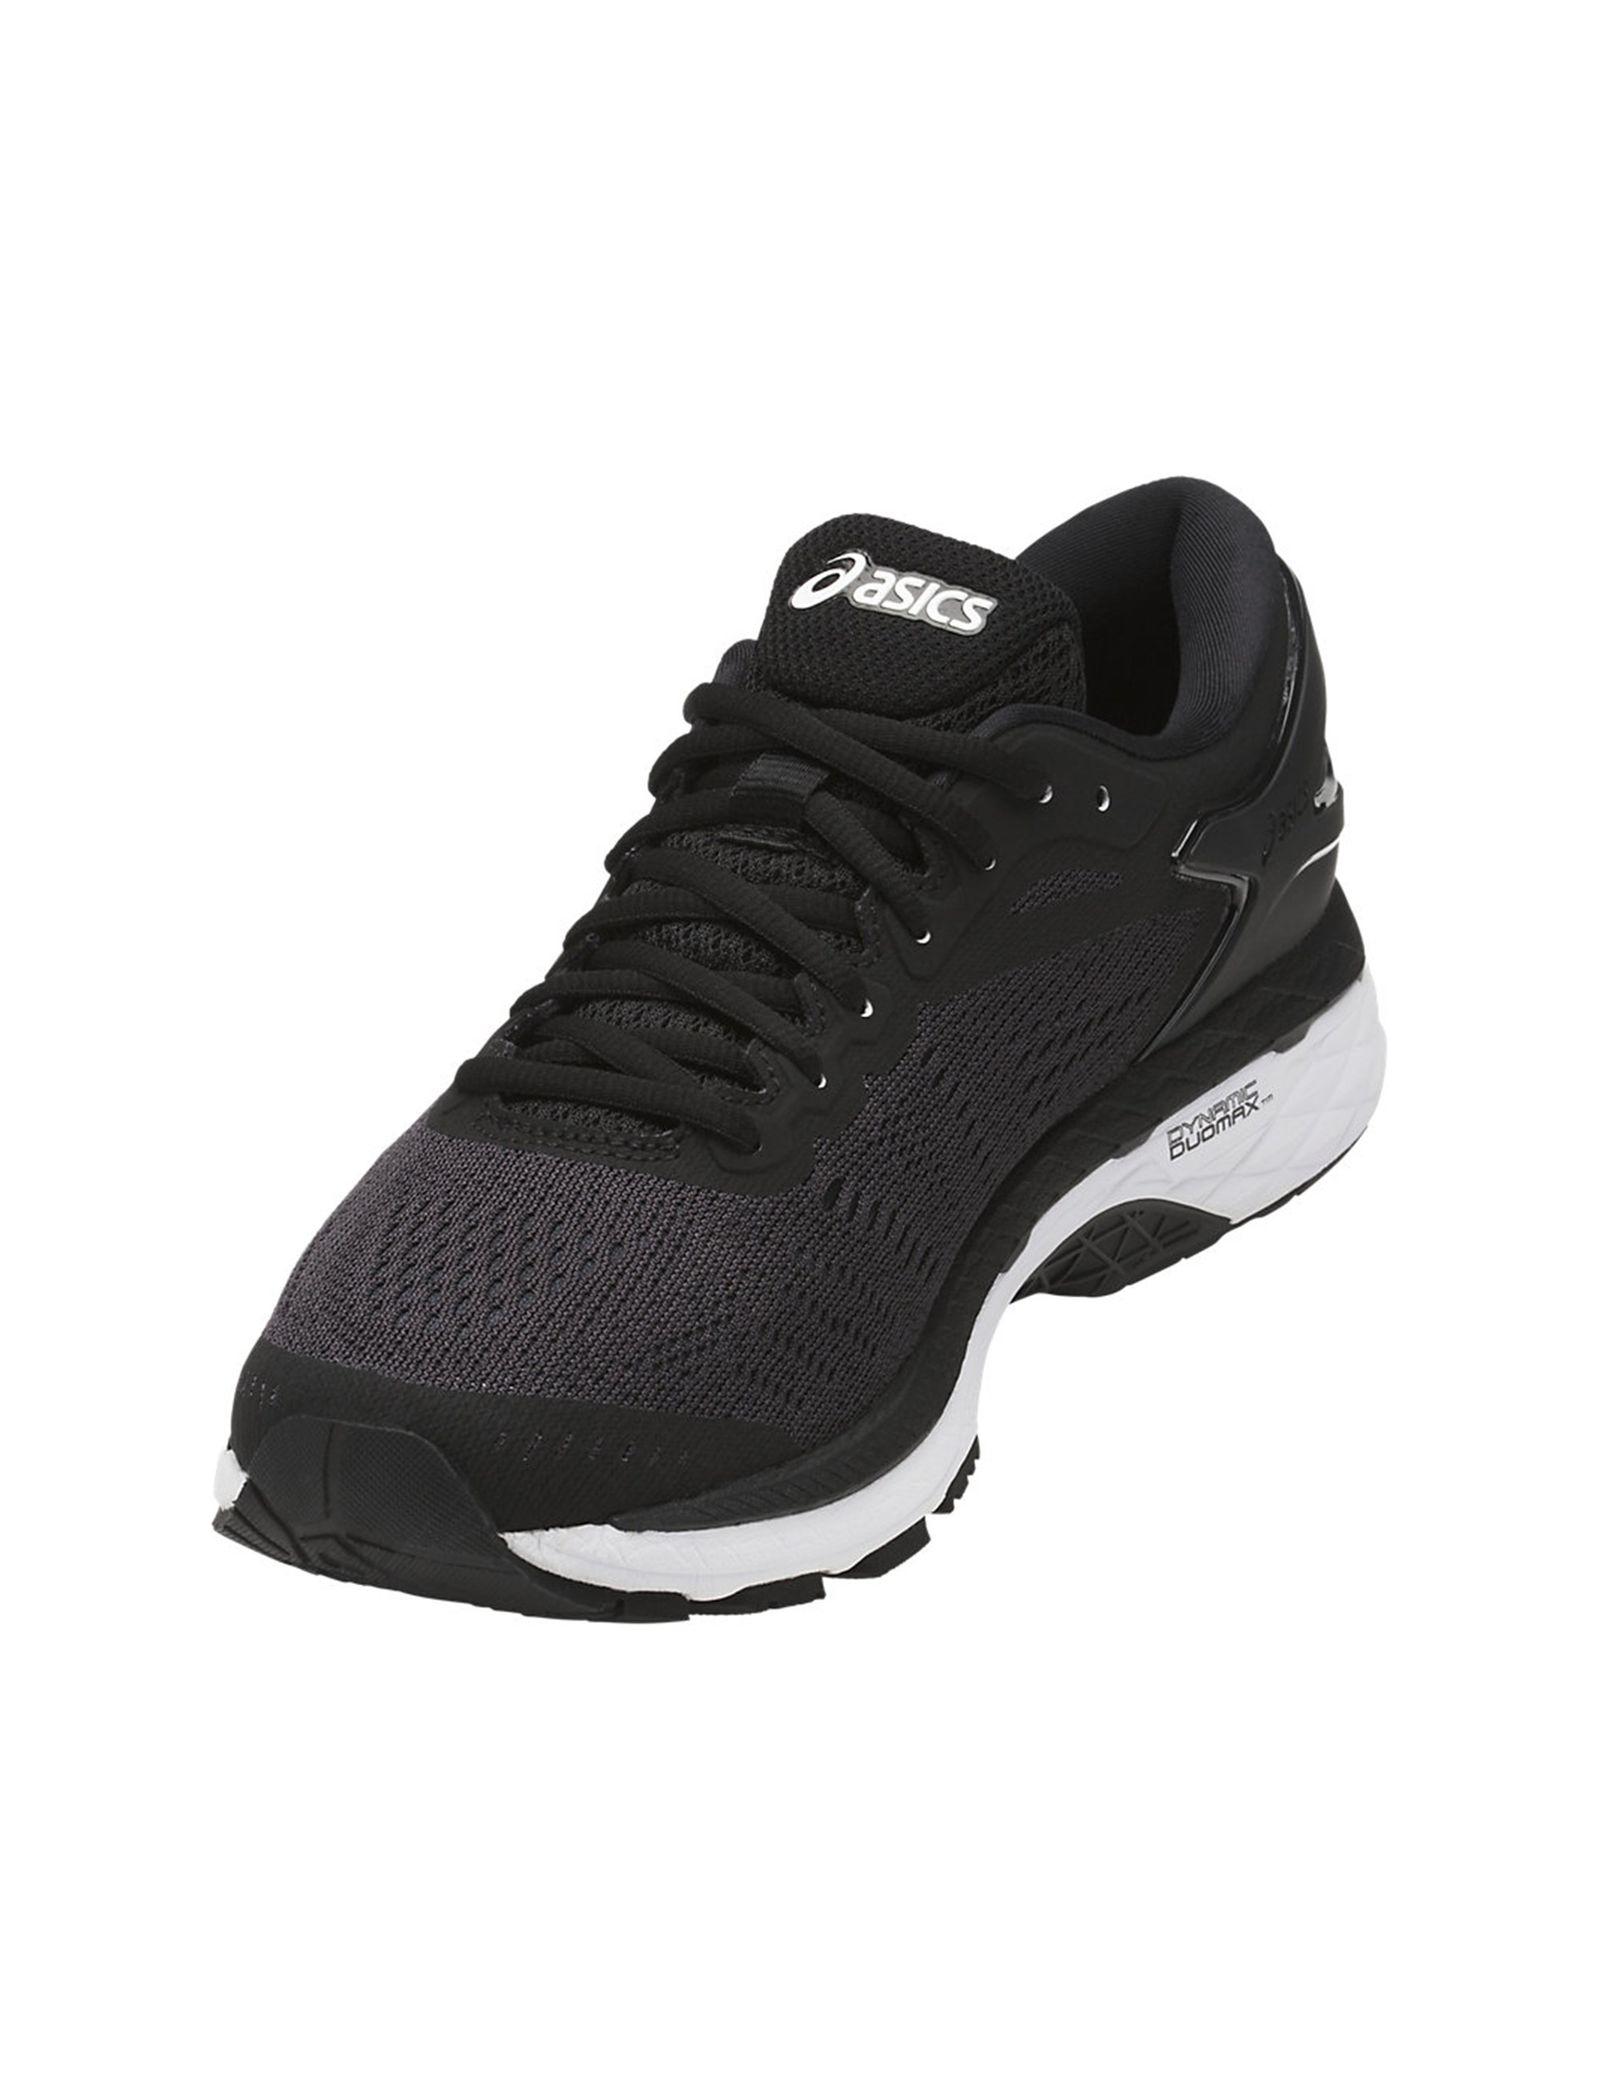 کفش دویدن بندی زنانه GEL-KAYANO 24 - اسیکس - مشکي - 5